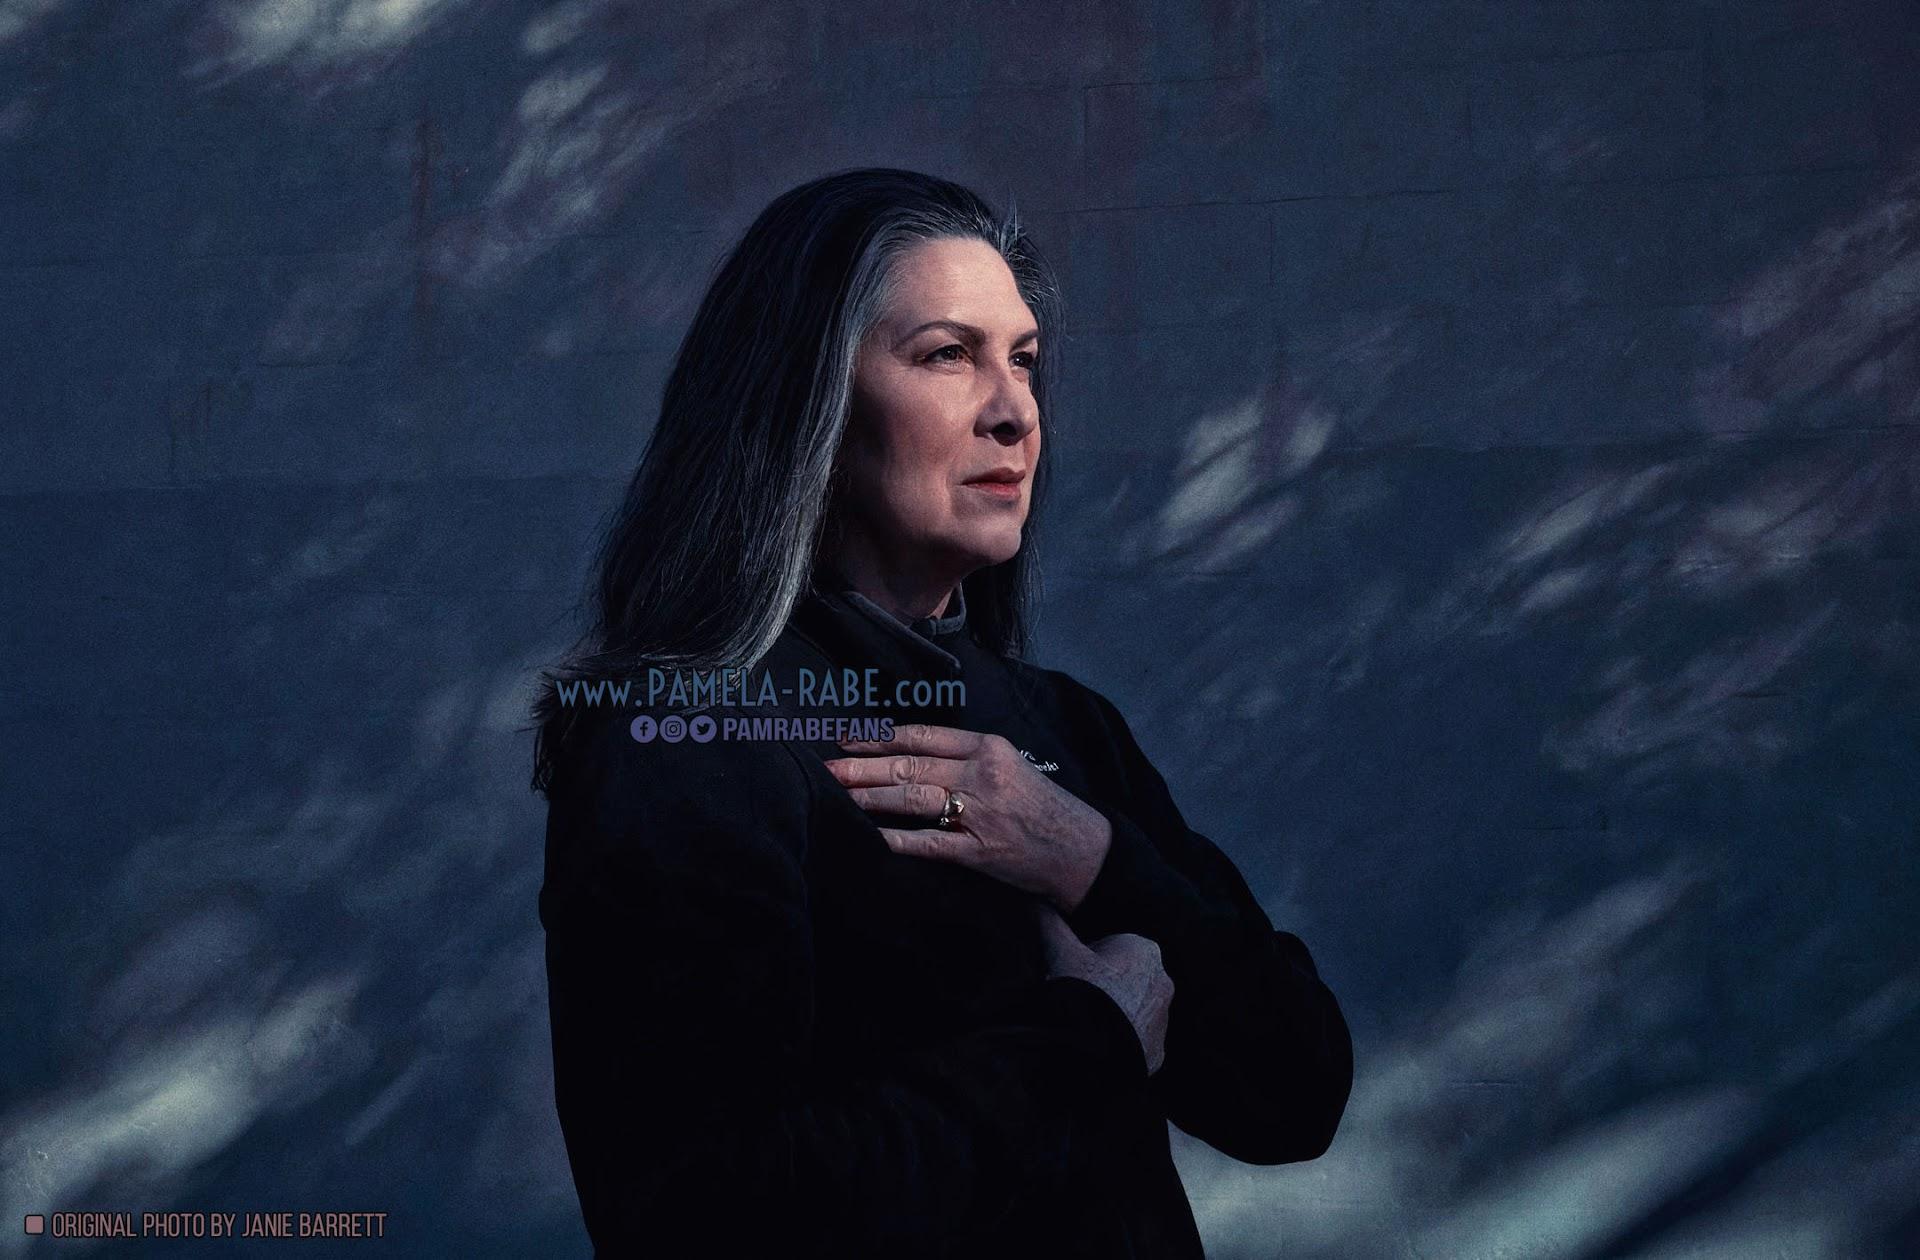 Pamela Rabe - Original Photo by Janie Barrett